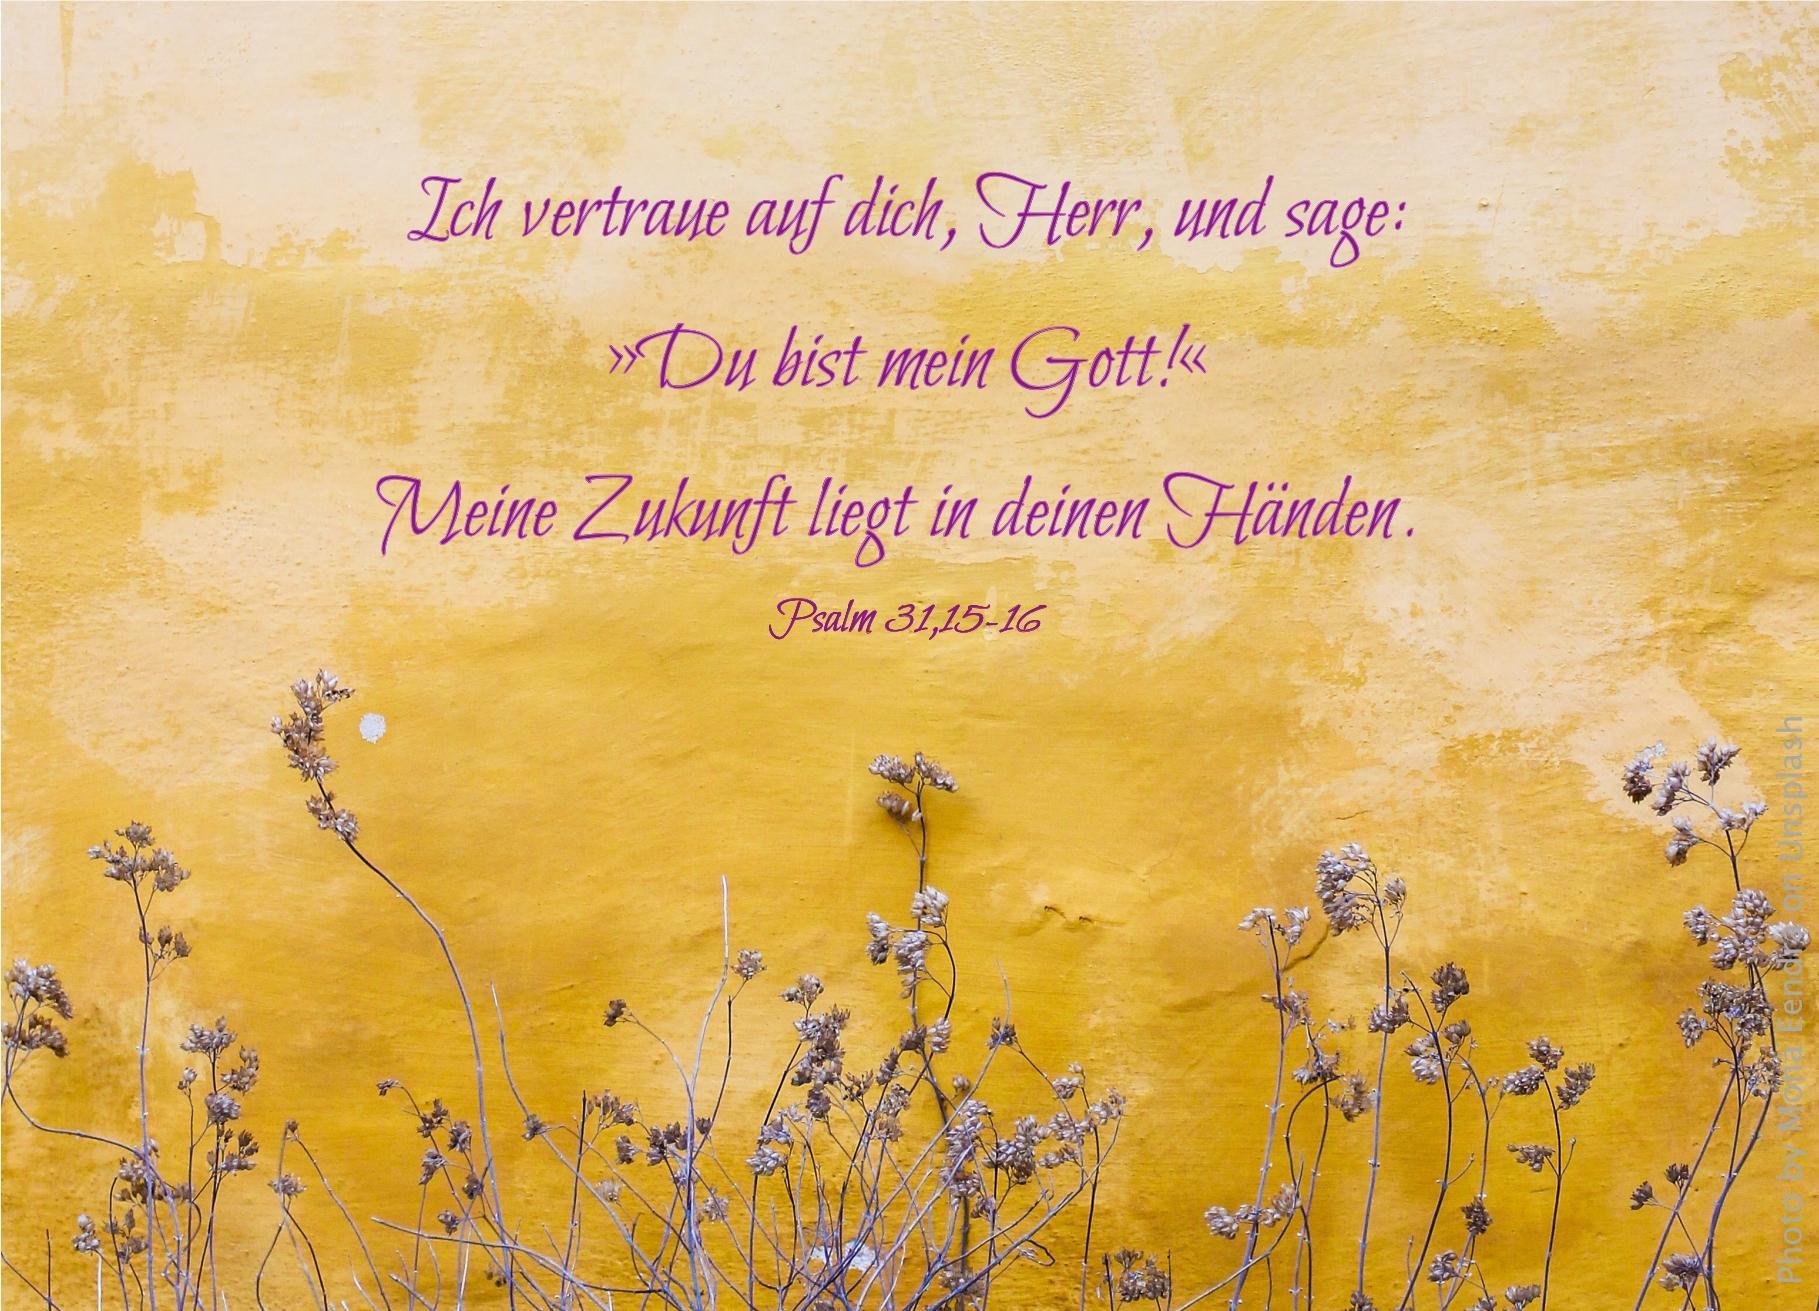 "alt=""blumen_vor_gelber_wand_erwartet_bibelhoerbuch_beten_fasten_besitz"""